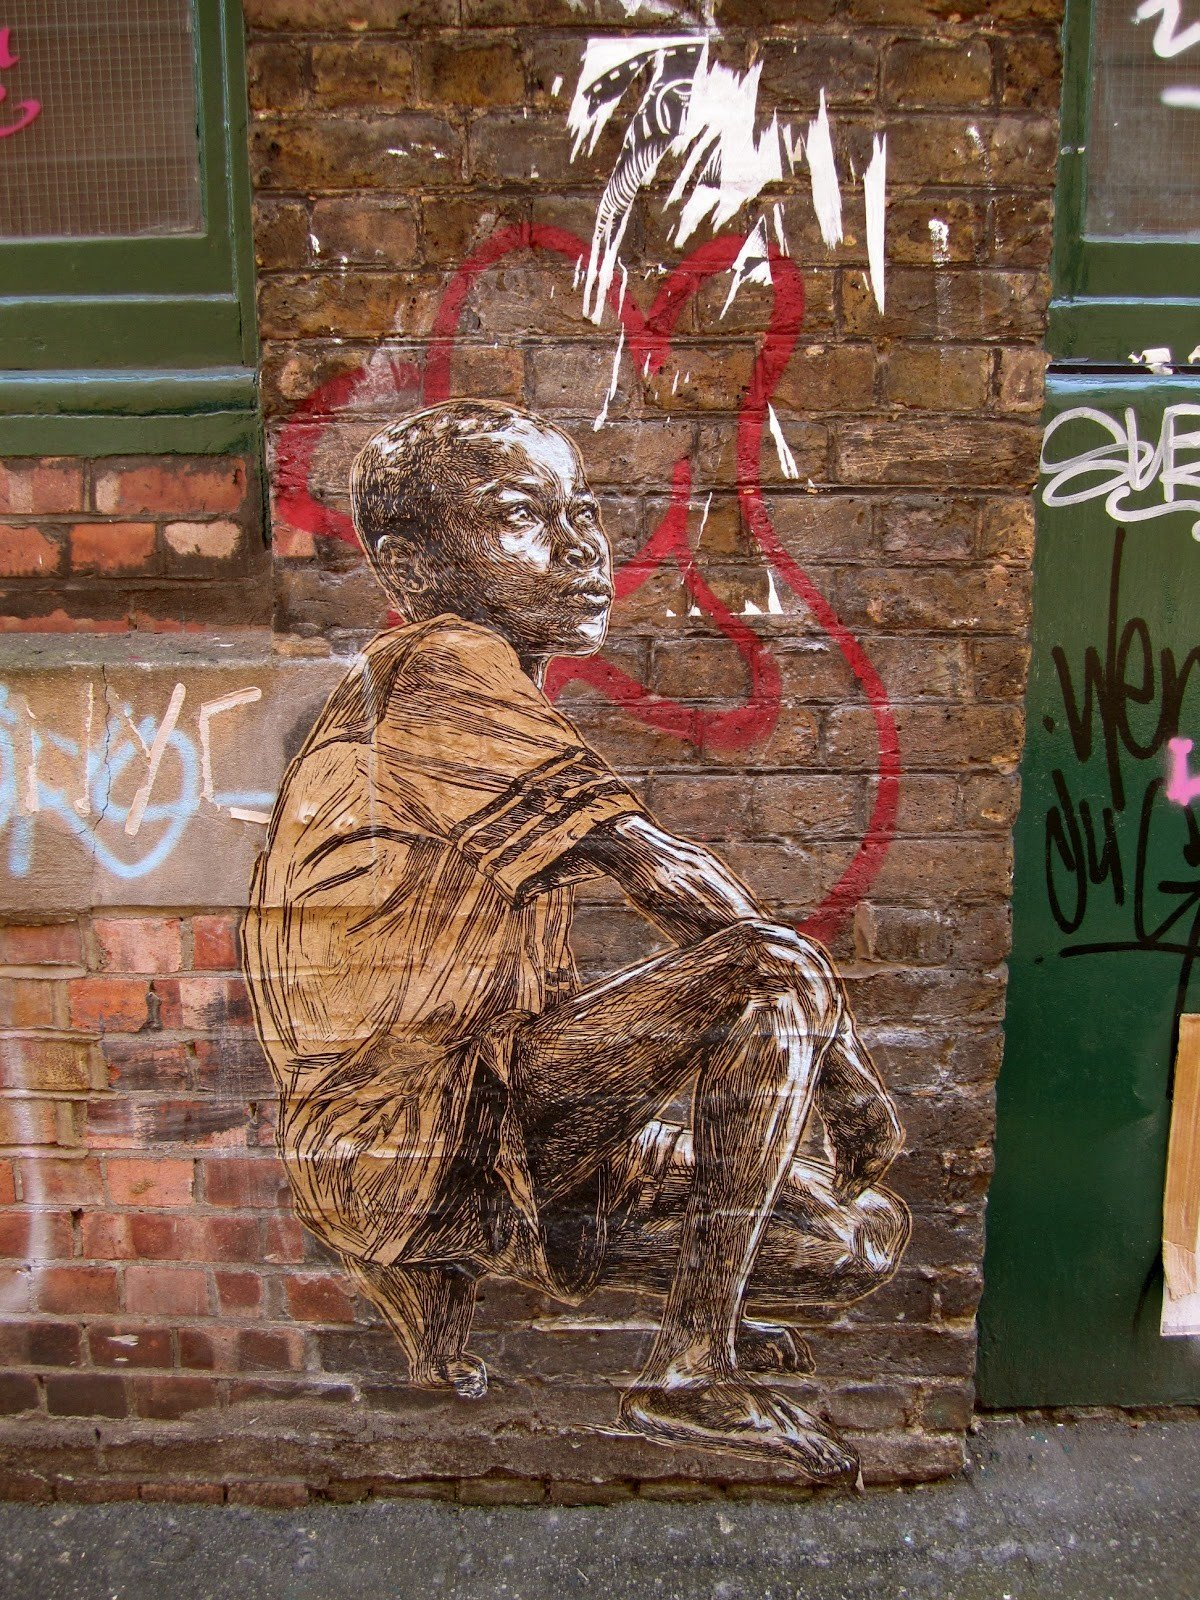 art Arts + Culture brick wall City city streets graffiti street art streets urban building wall sculpture wood carving painting brick ancient history mural